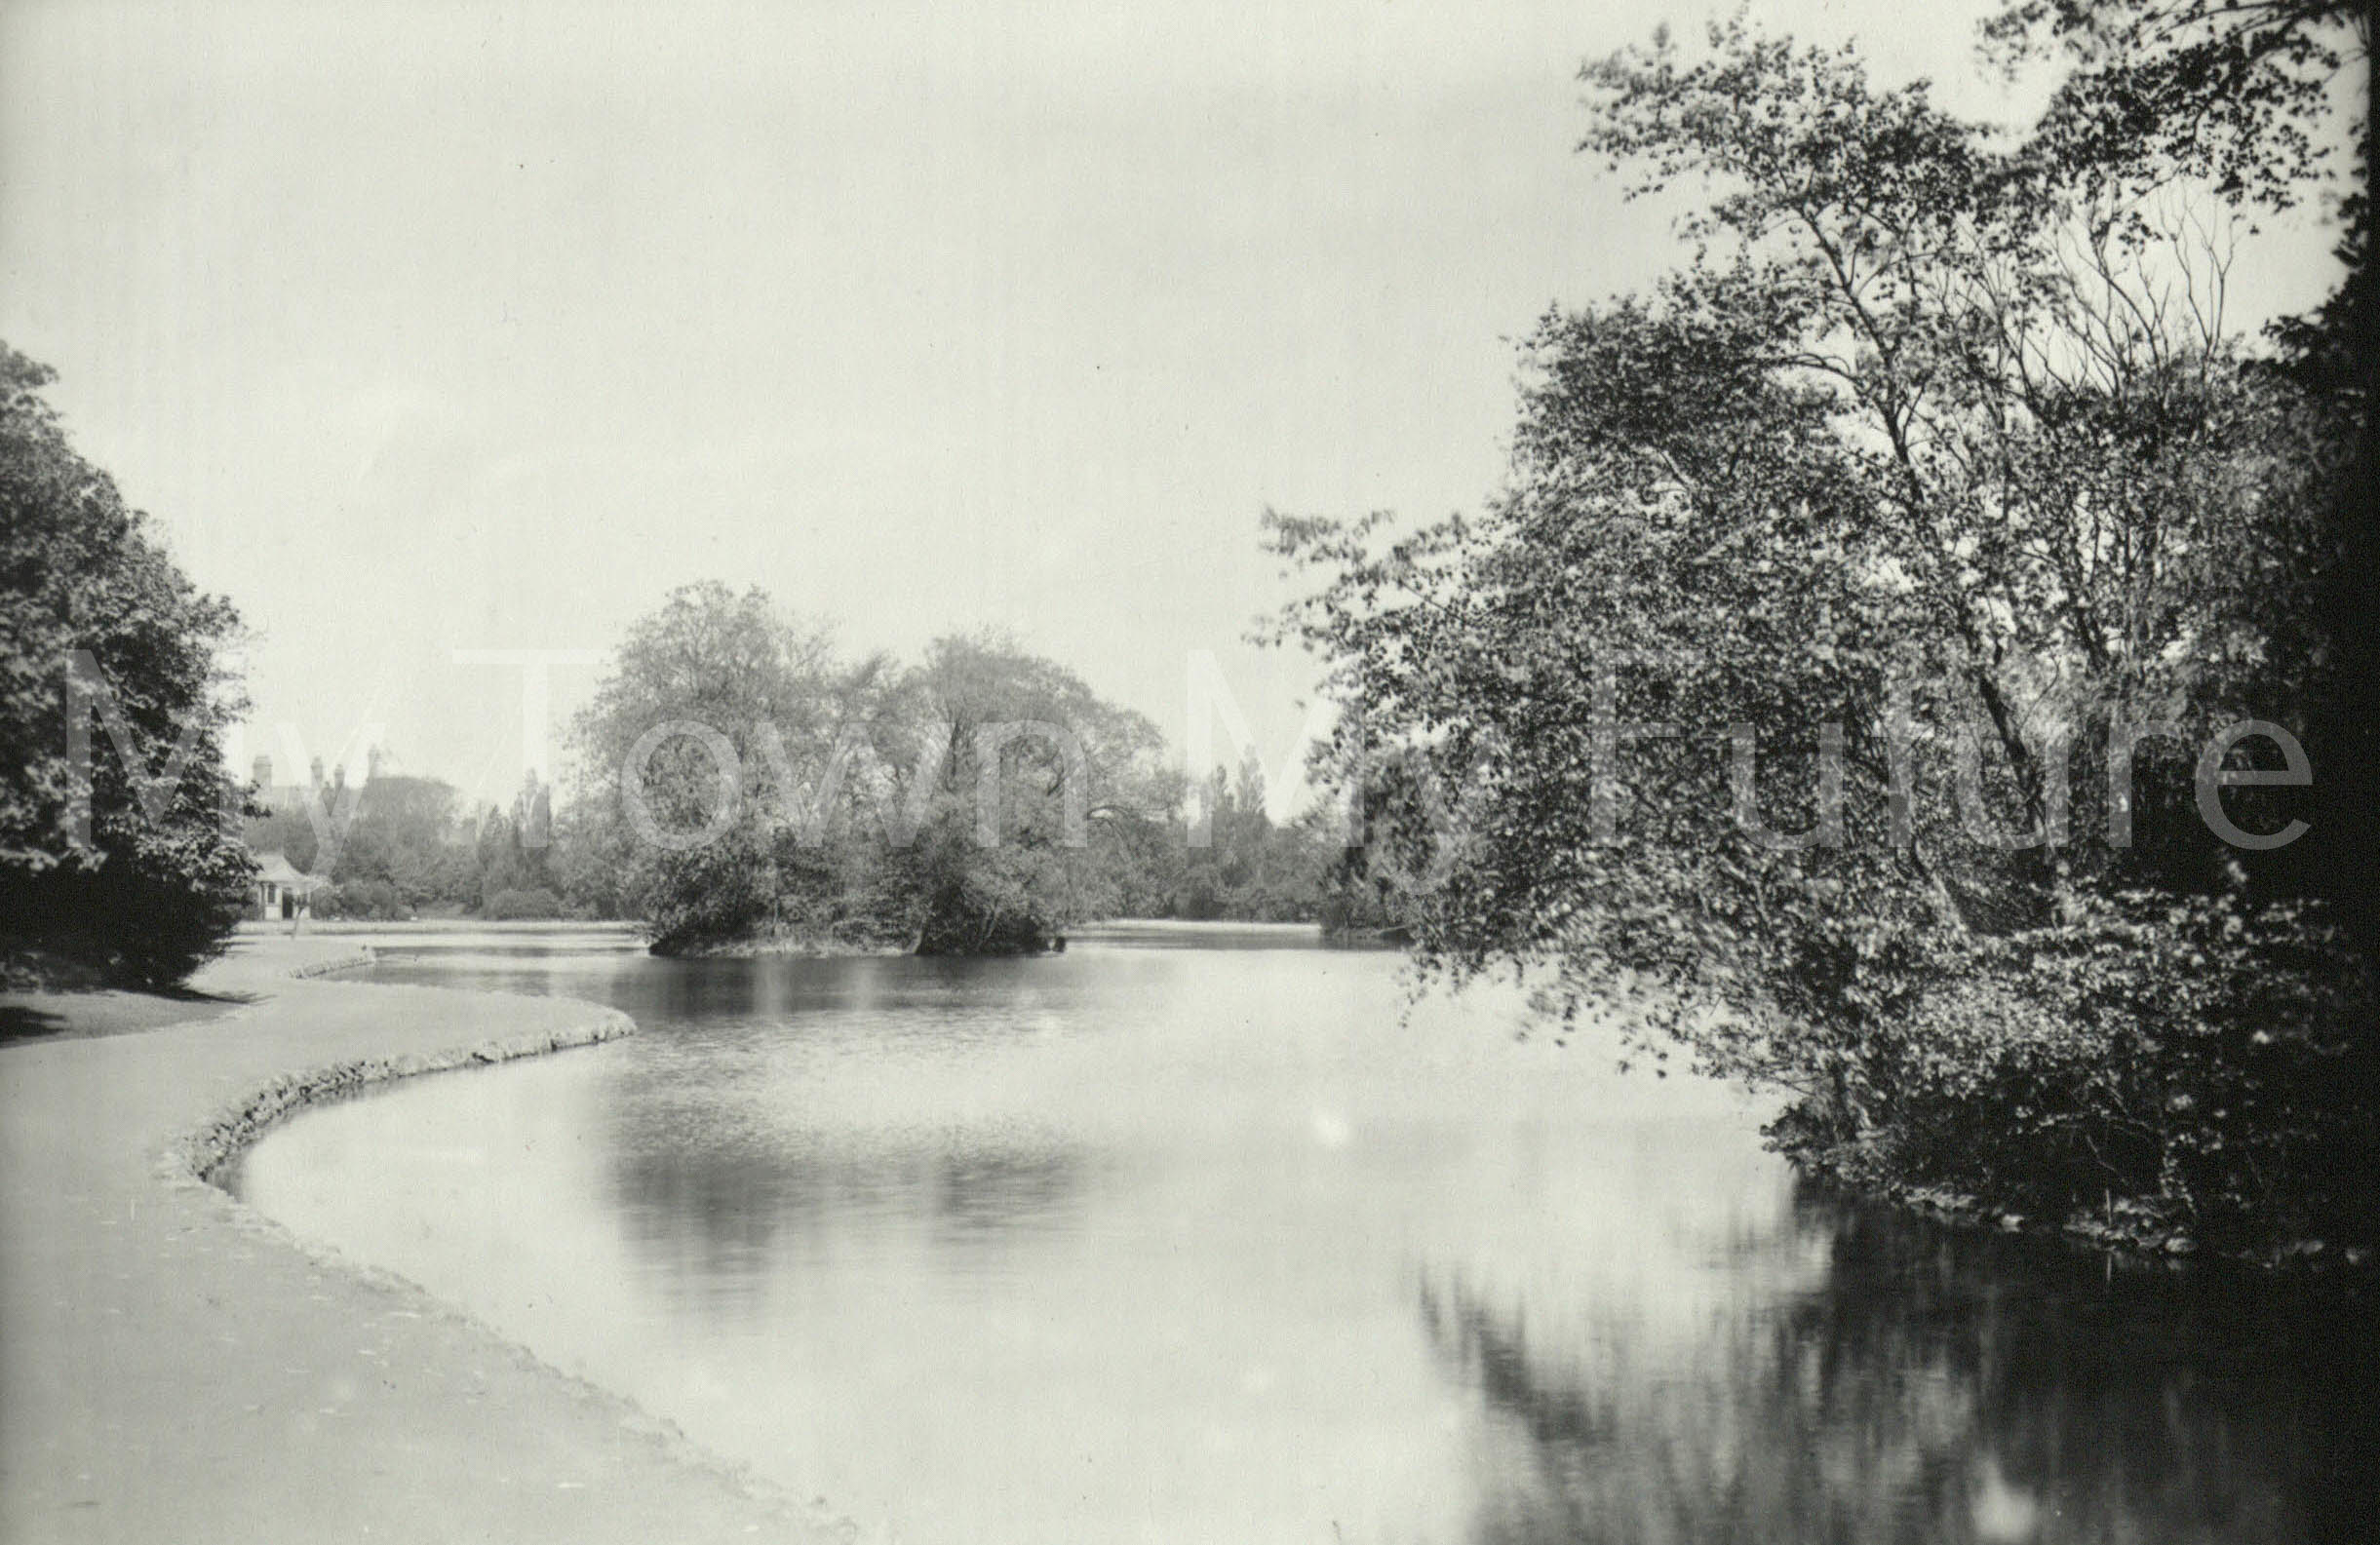 Albert Park, View of the Lake